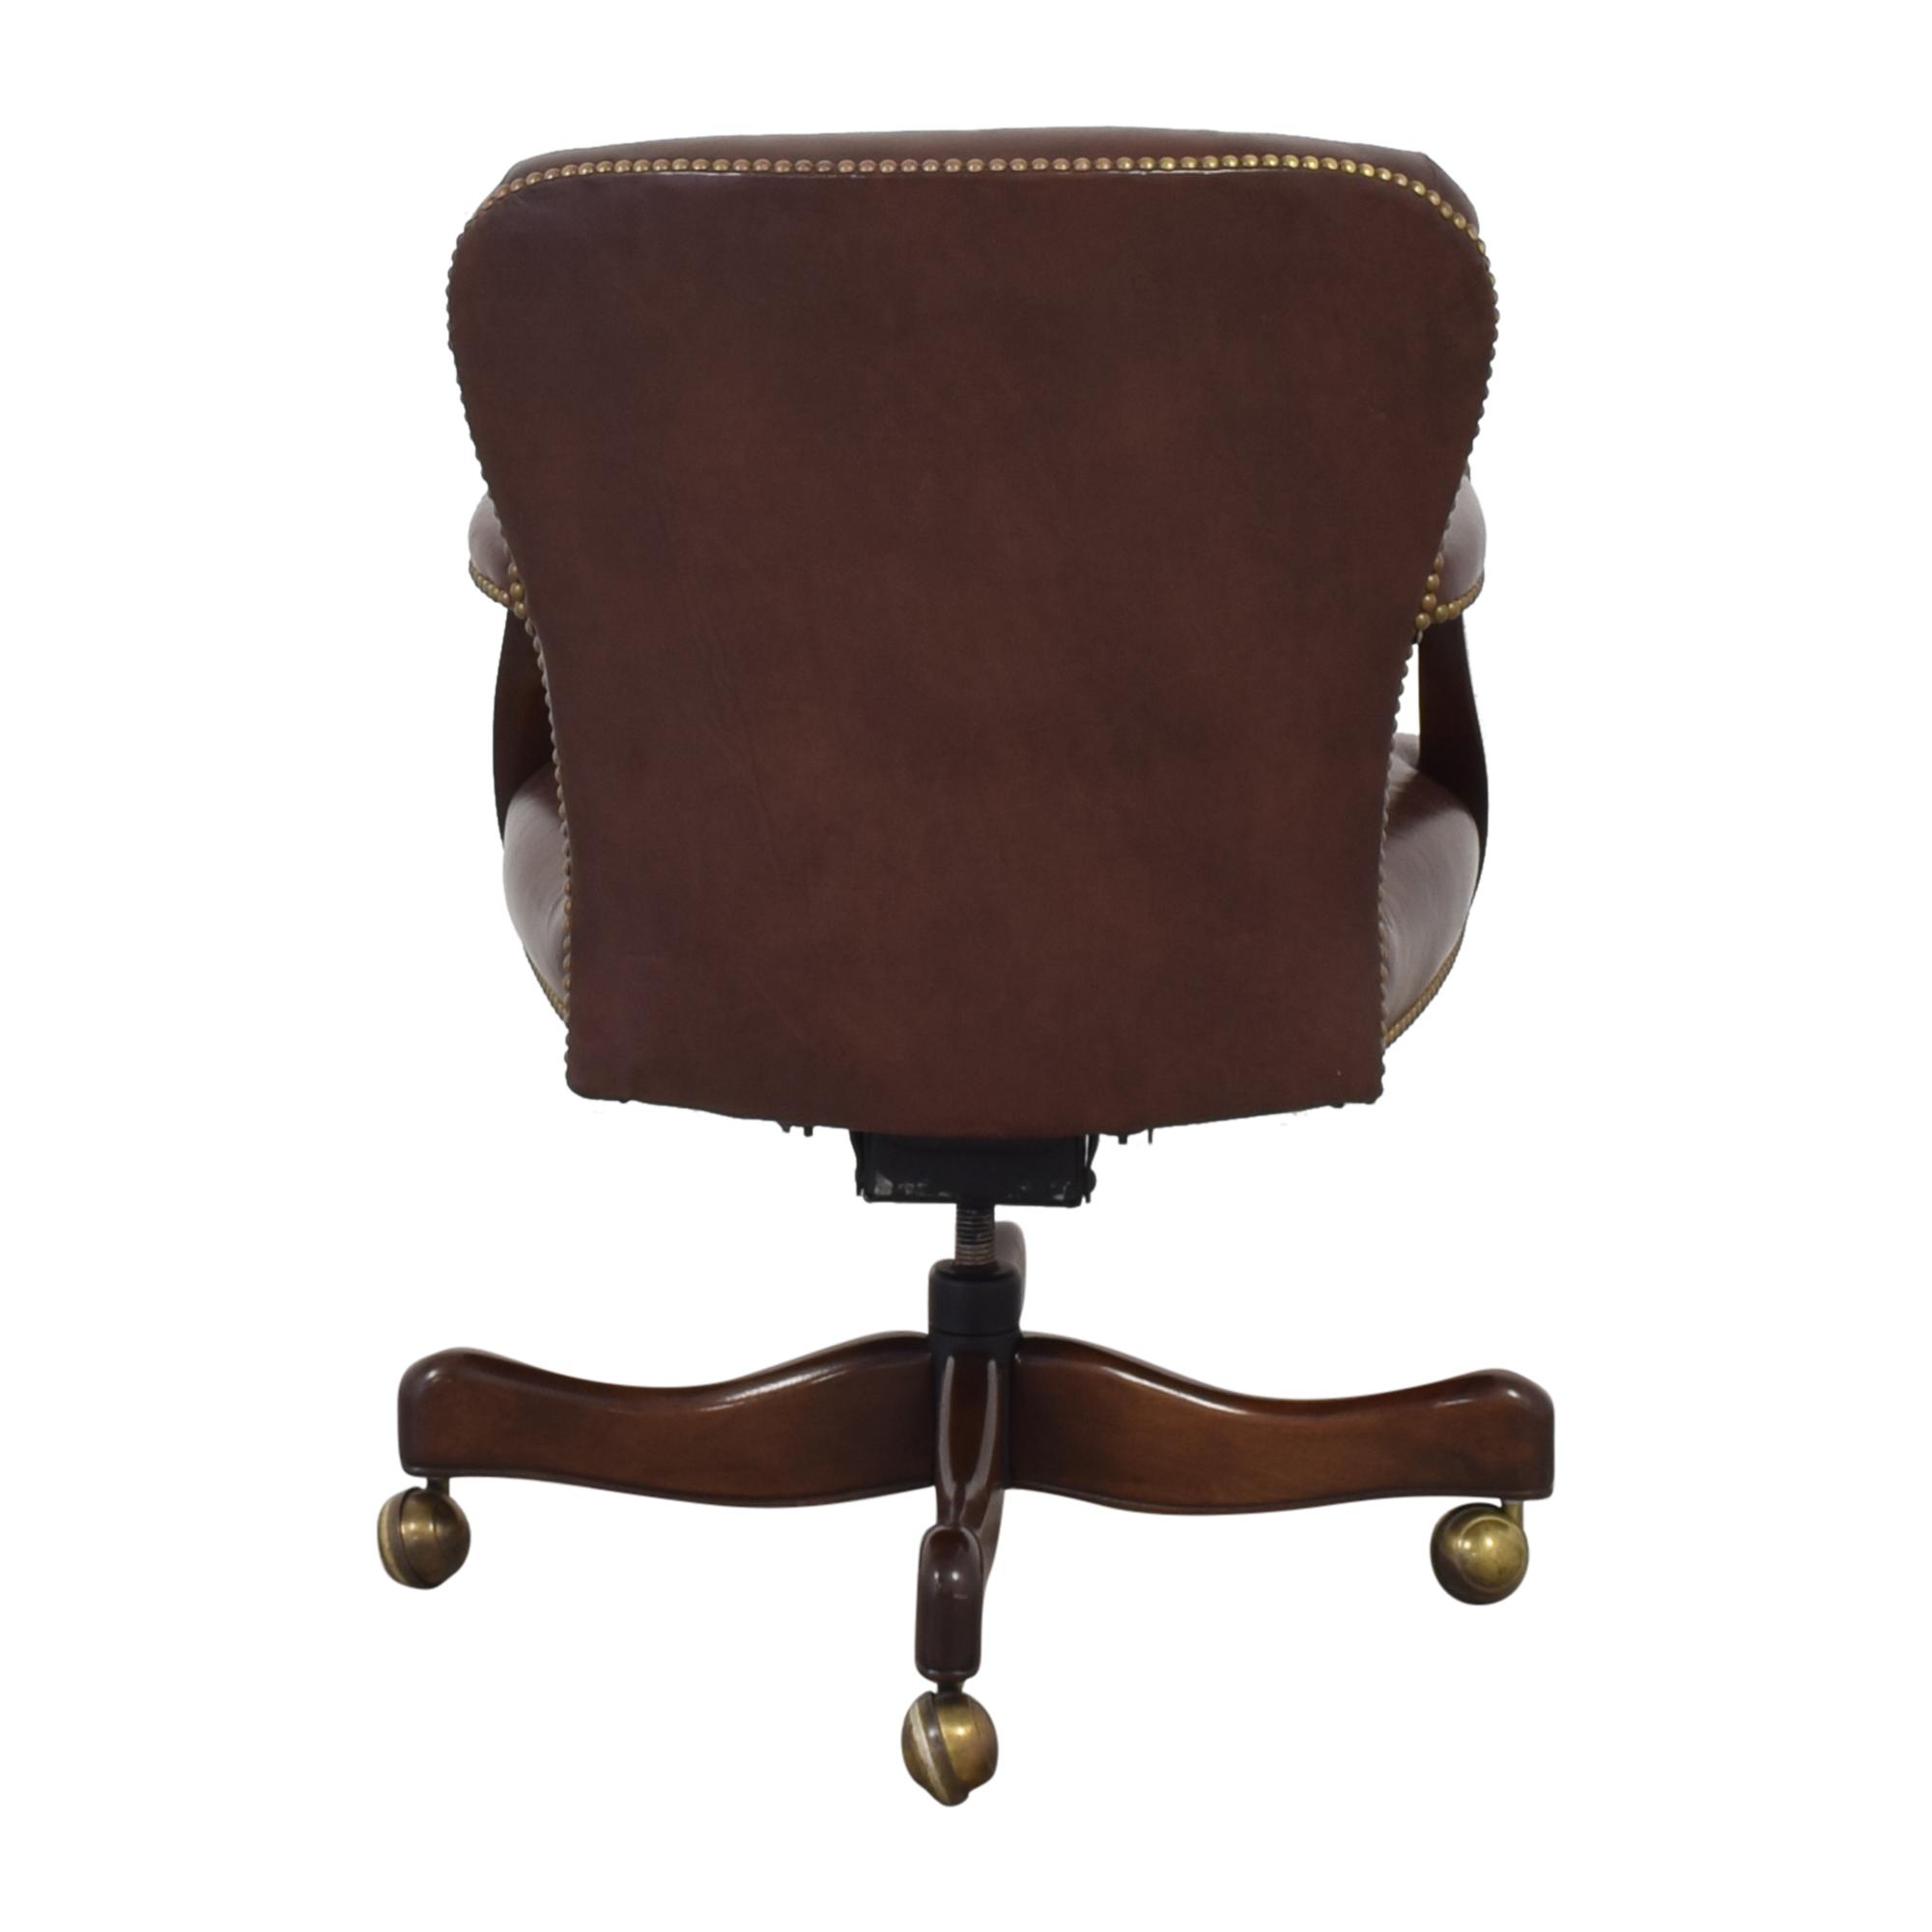 Hickory Chair Swivel Tilt Desk Chair / Home Office Chairs